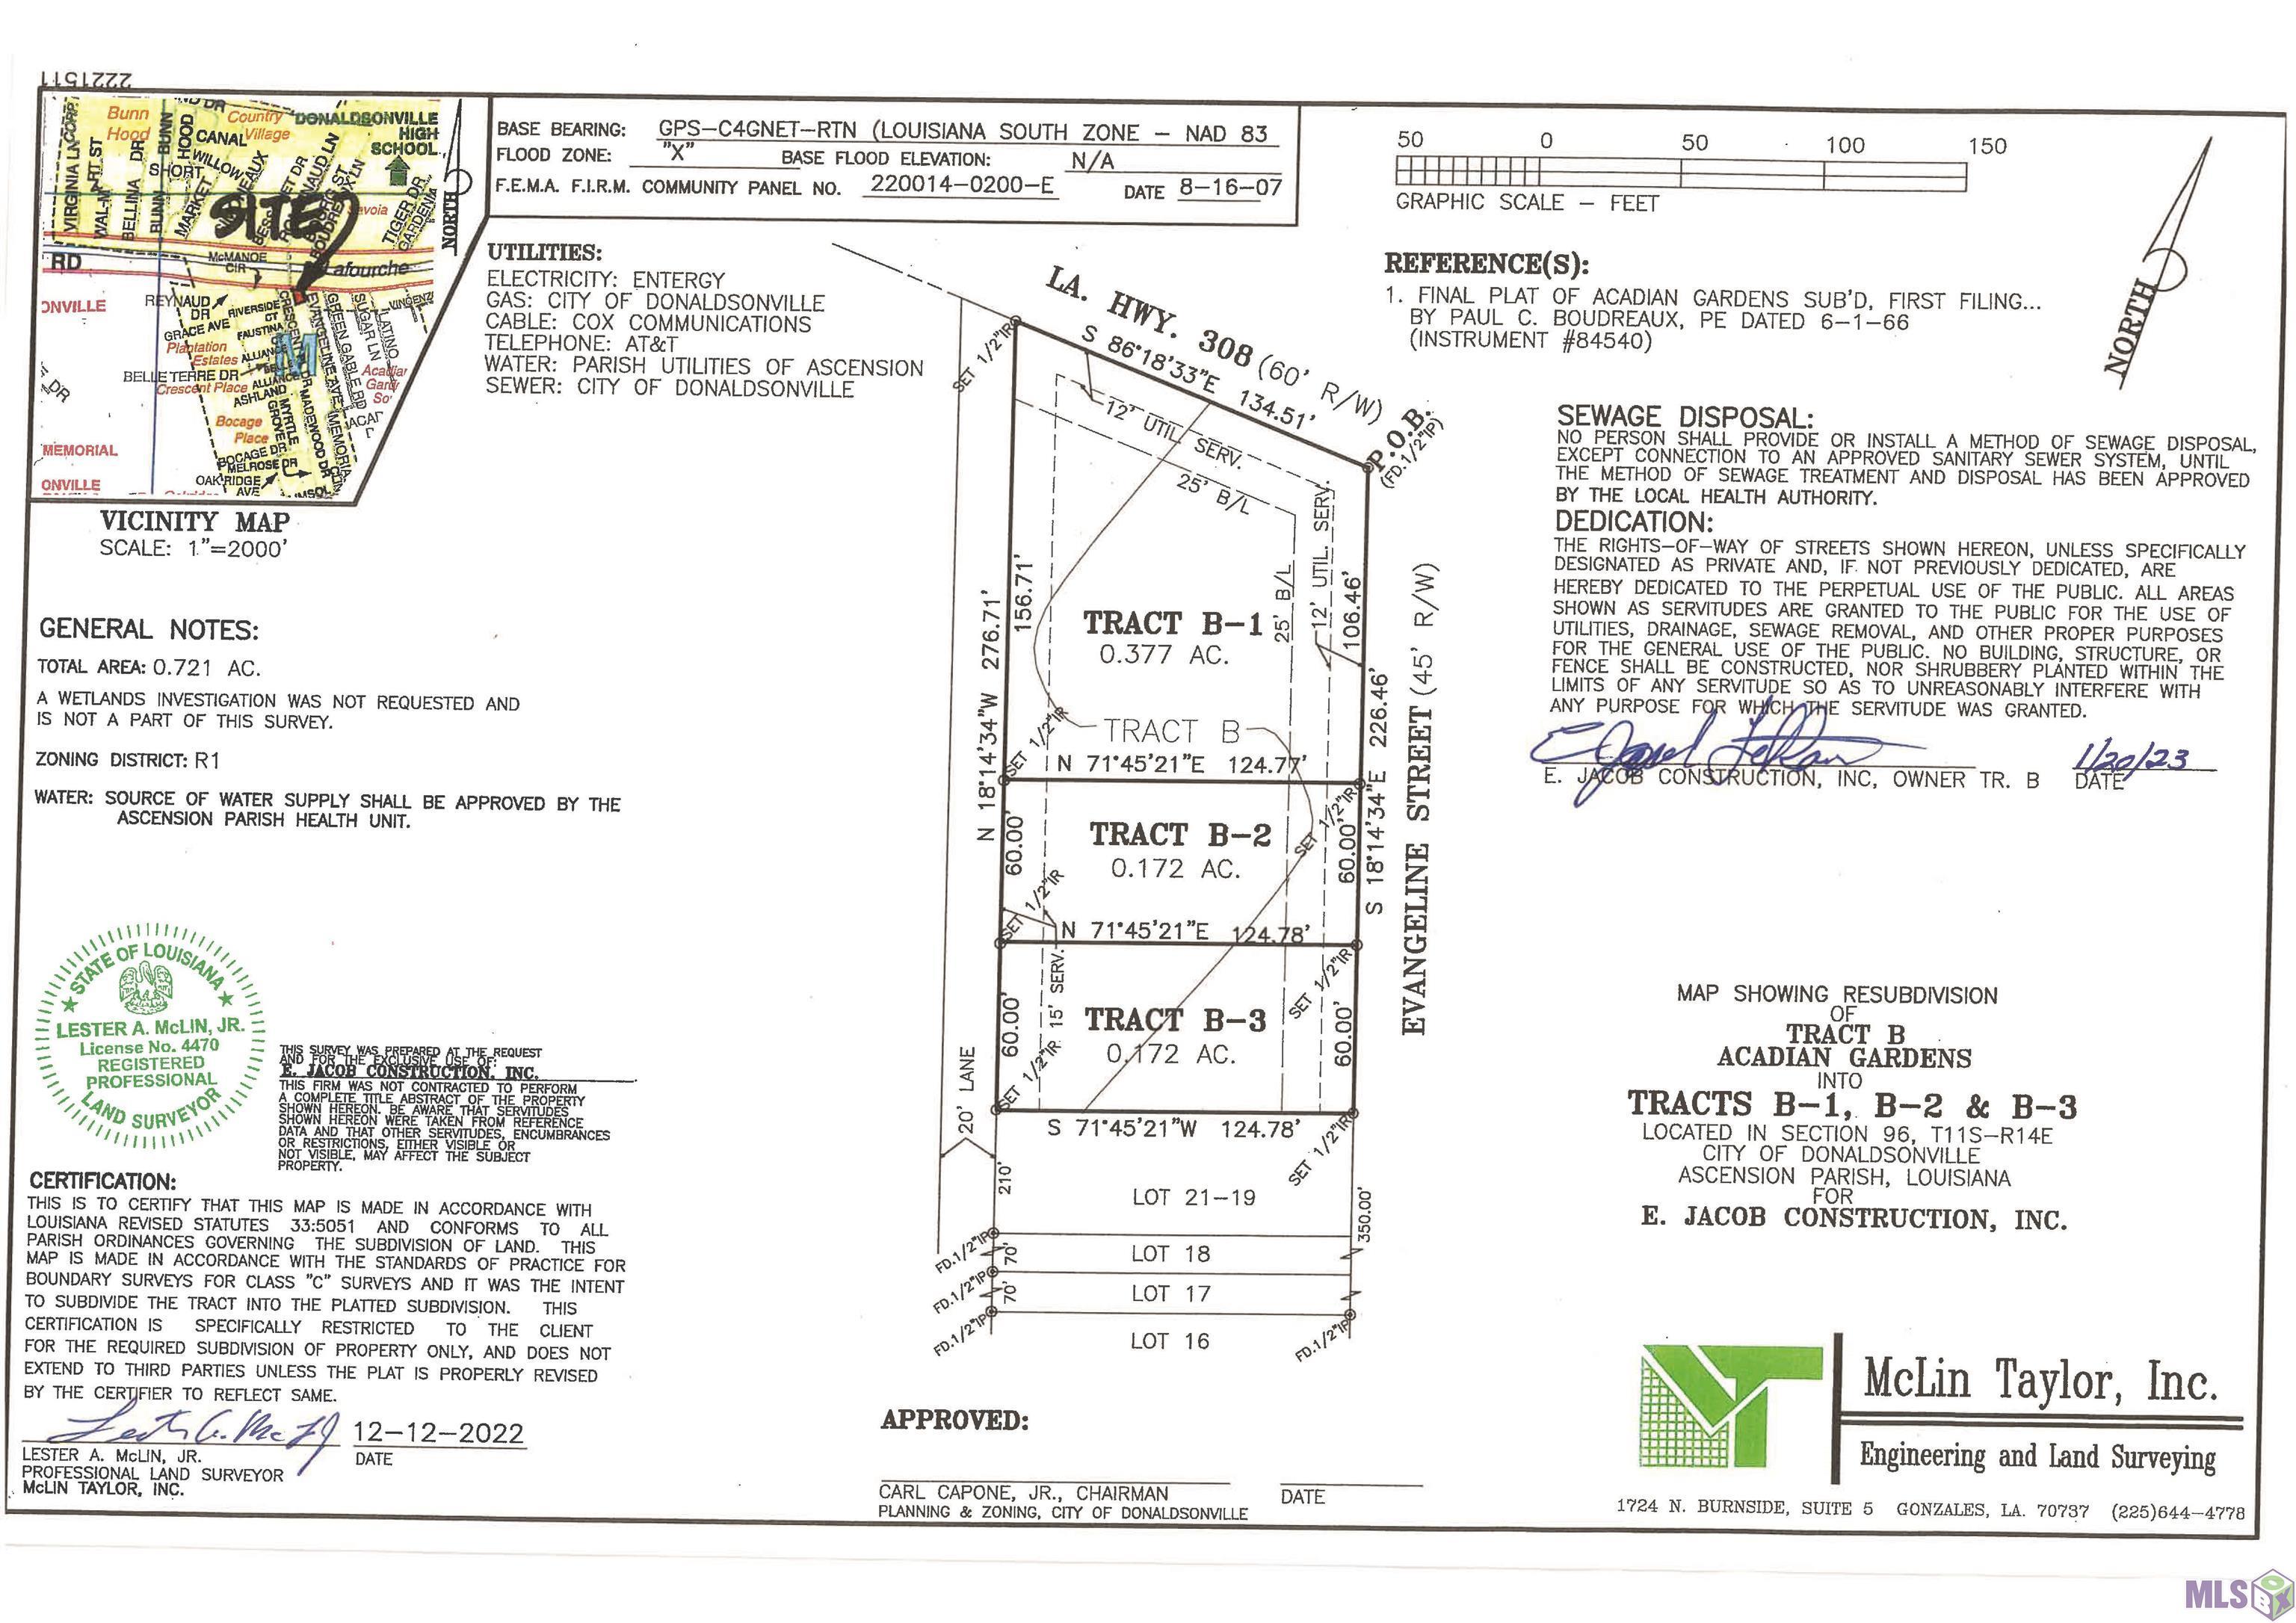 Proposed lot D EVANGELINE DR, Donaldsonville, LA 70346